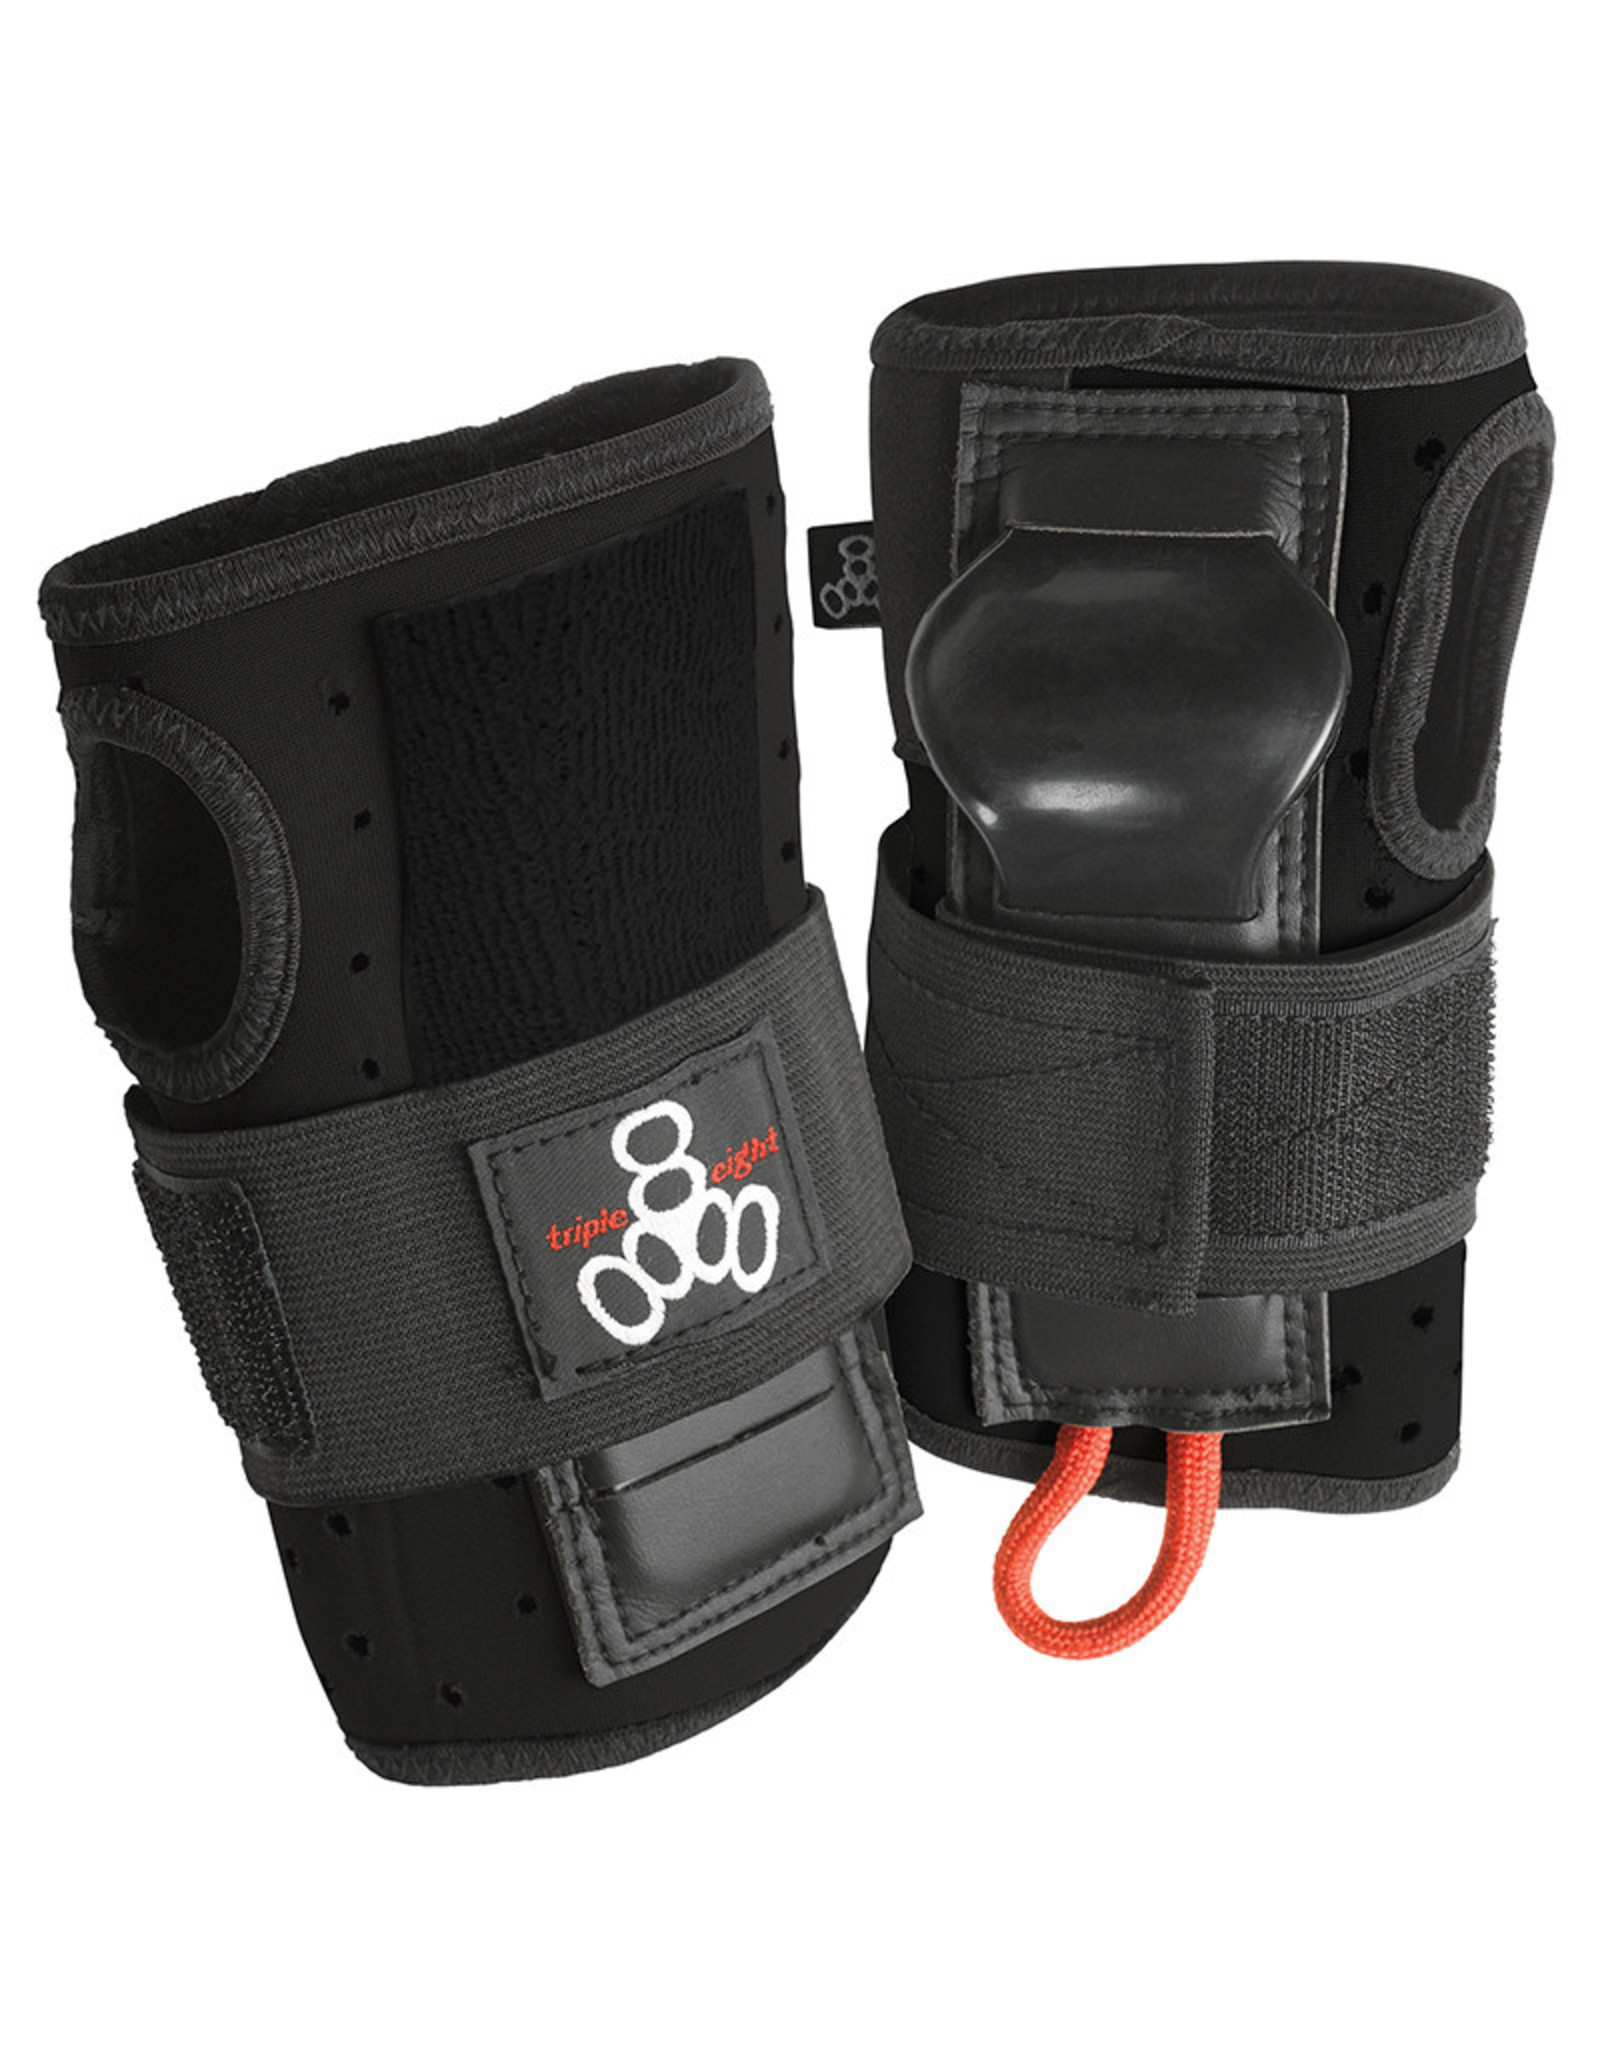 Triple 8 T8 RD Wristsaver